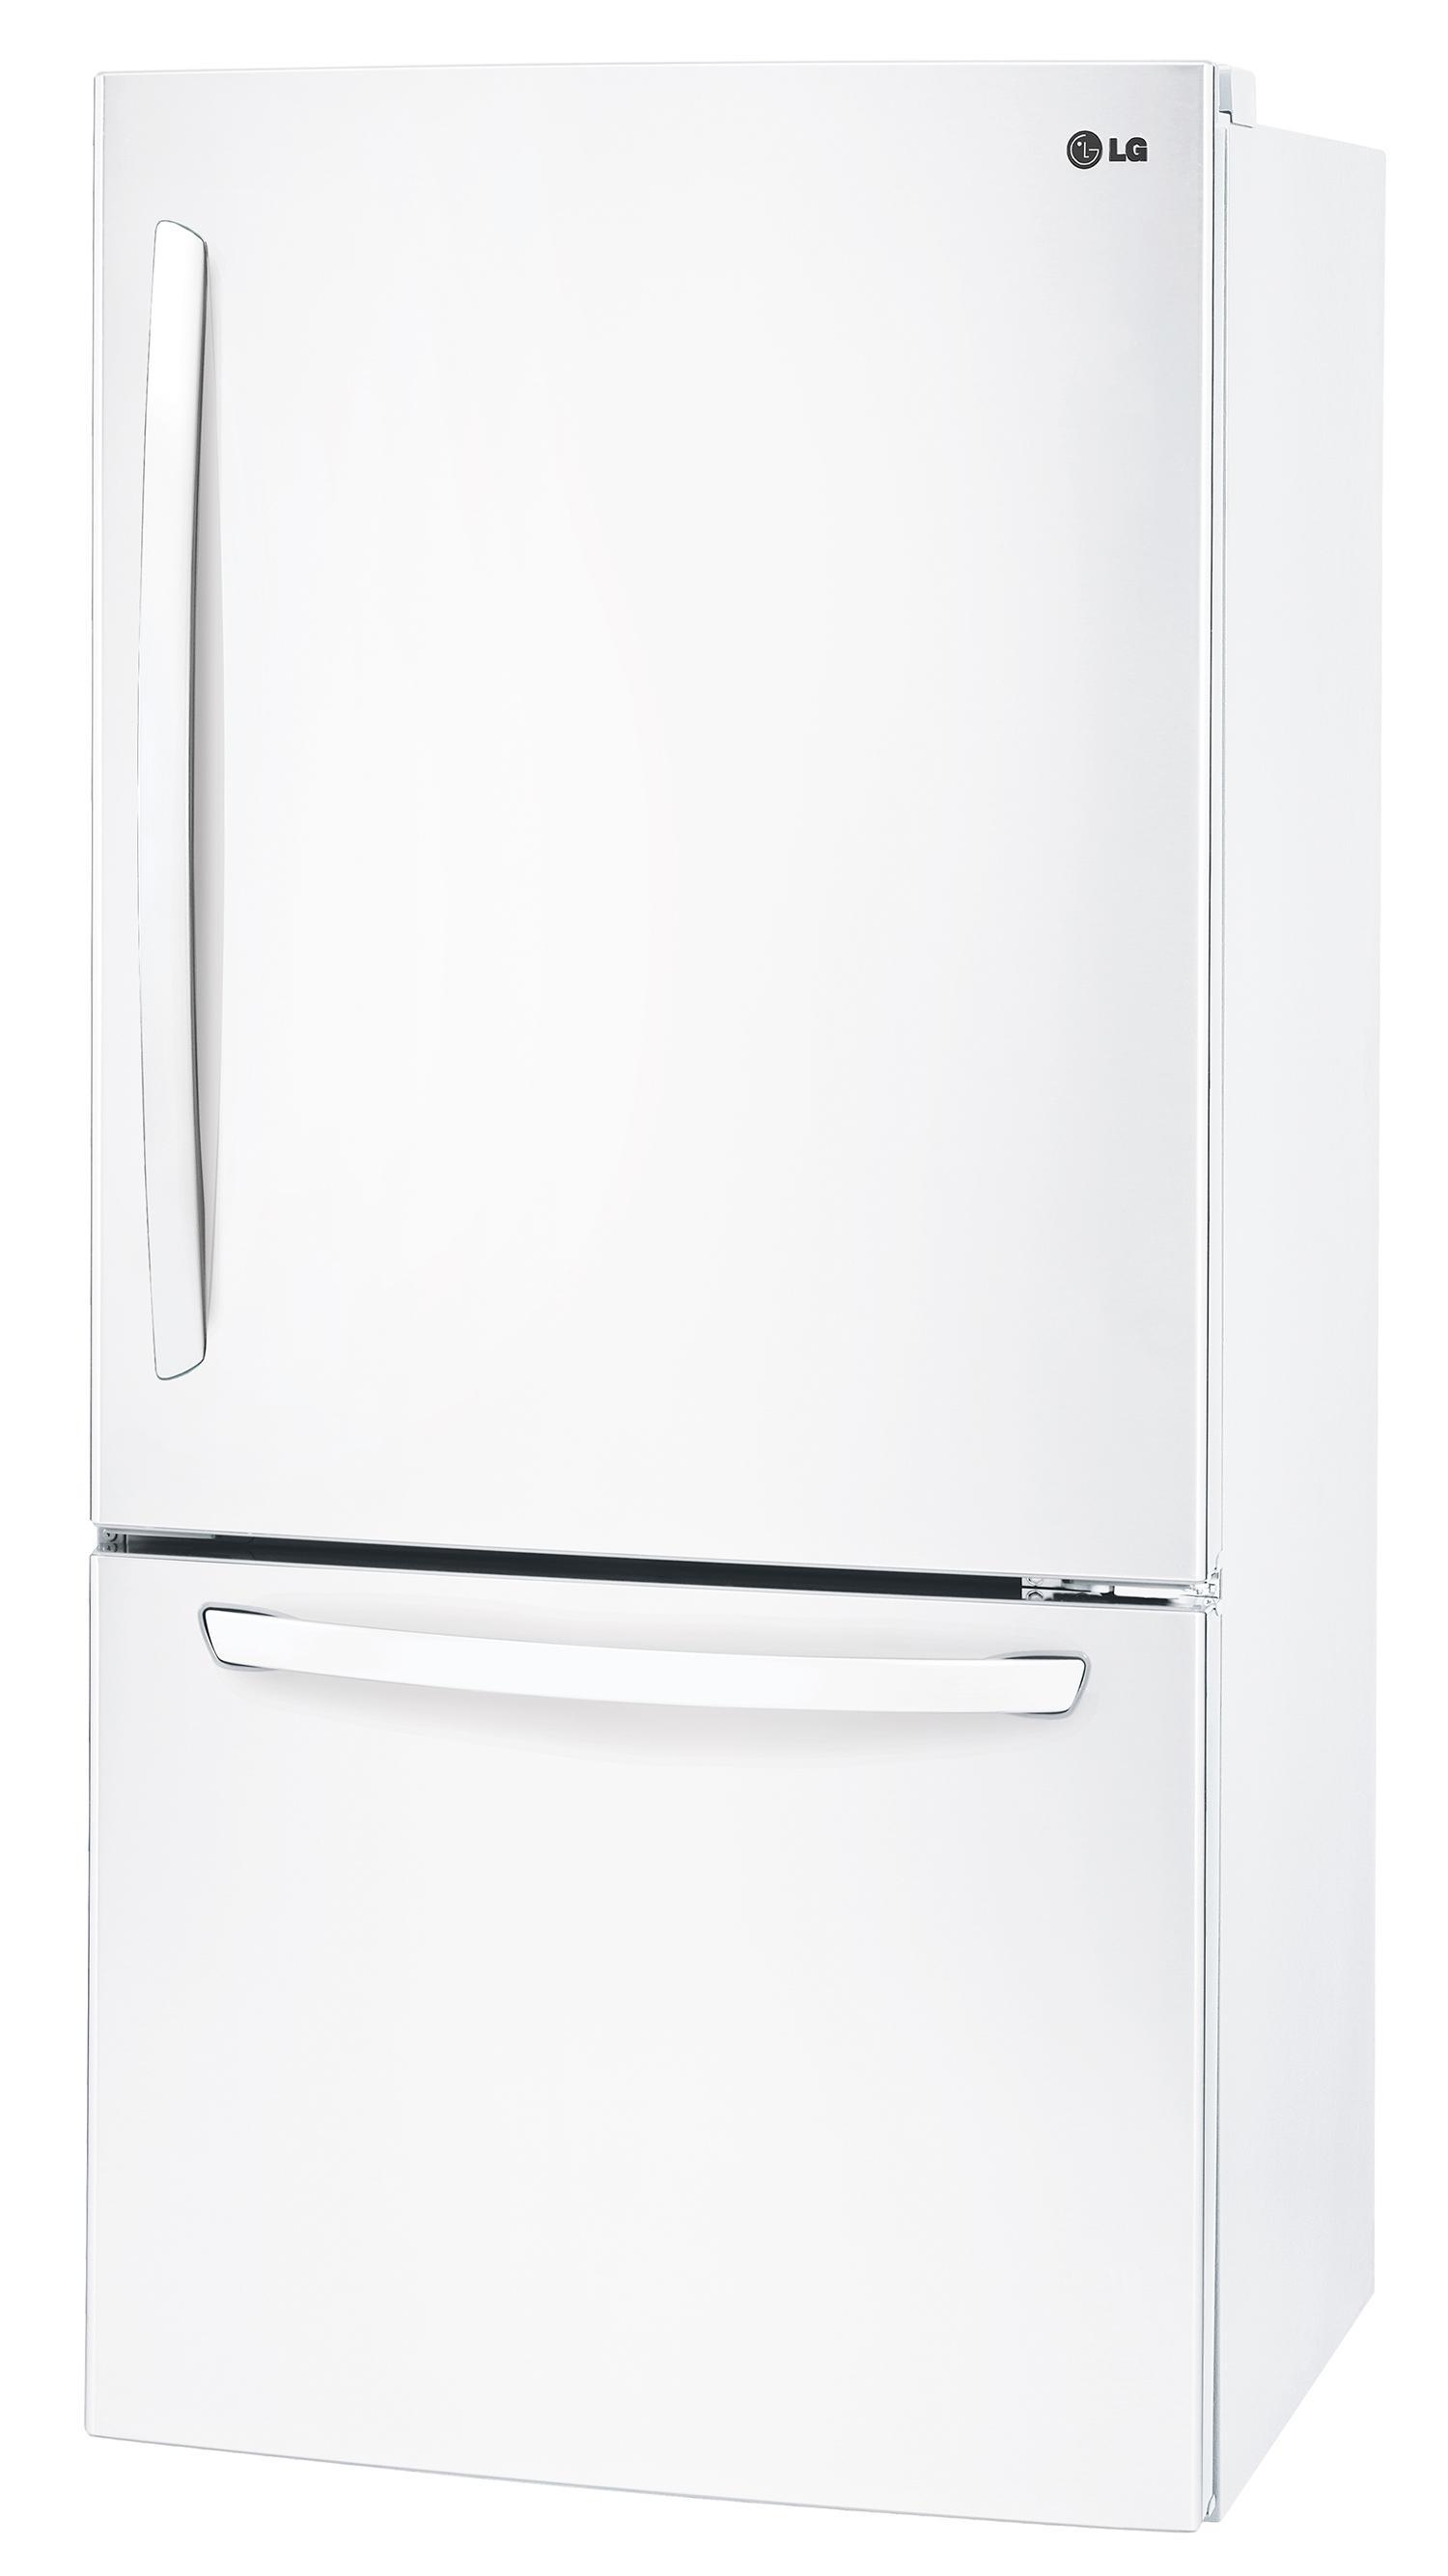 Ldcs24223s Lg Ldcs24223s Bottom Freezer Refrigerators